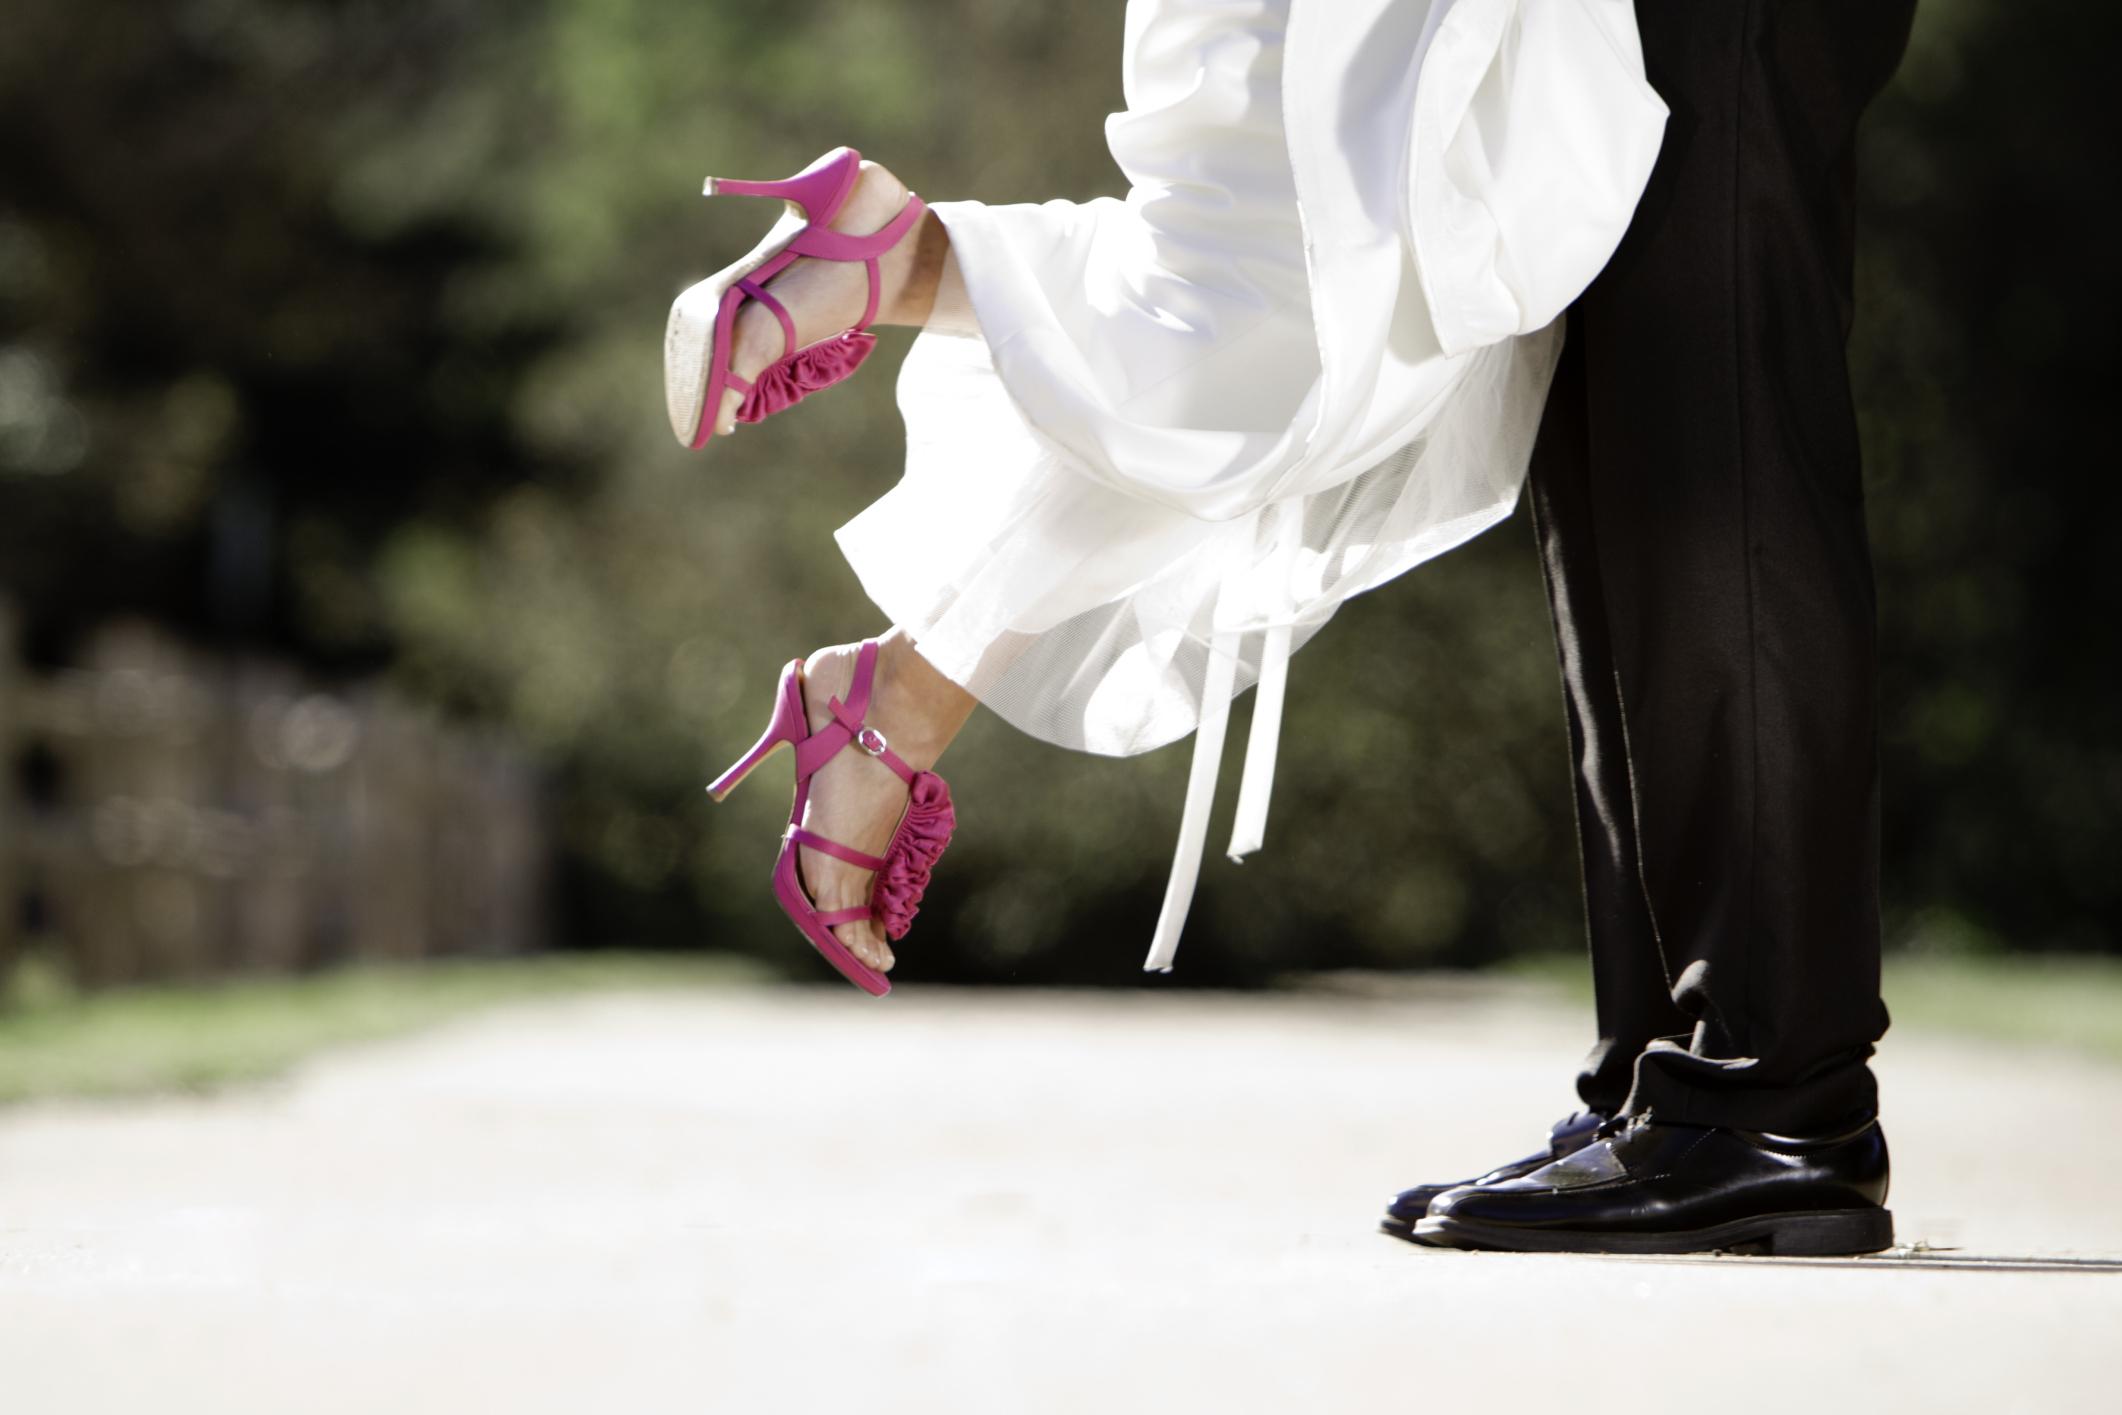 15c4e2b27d2e Wearing high heel bridal shoes